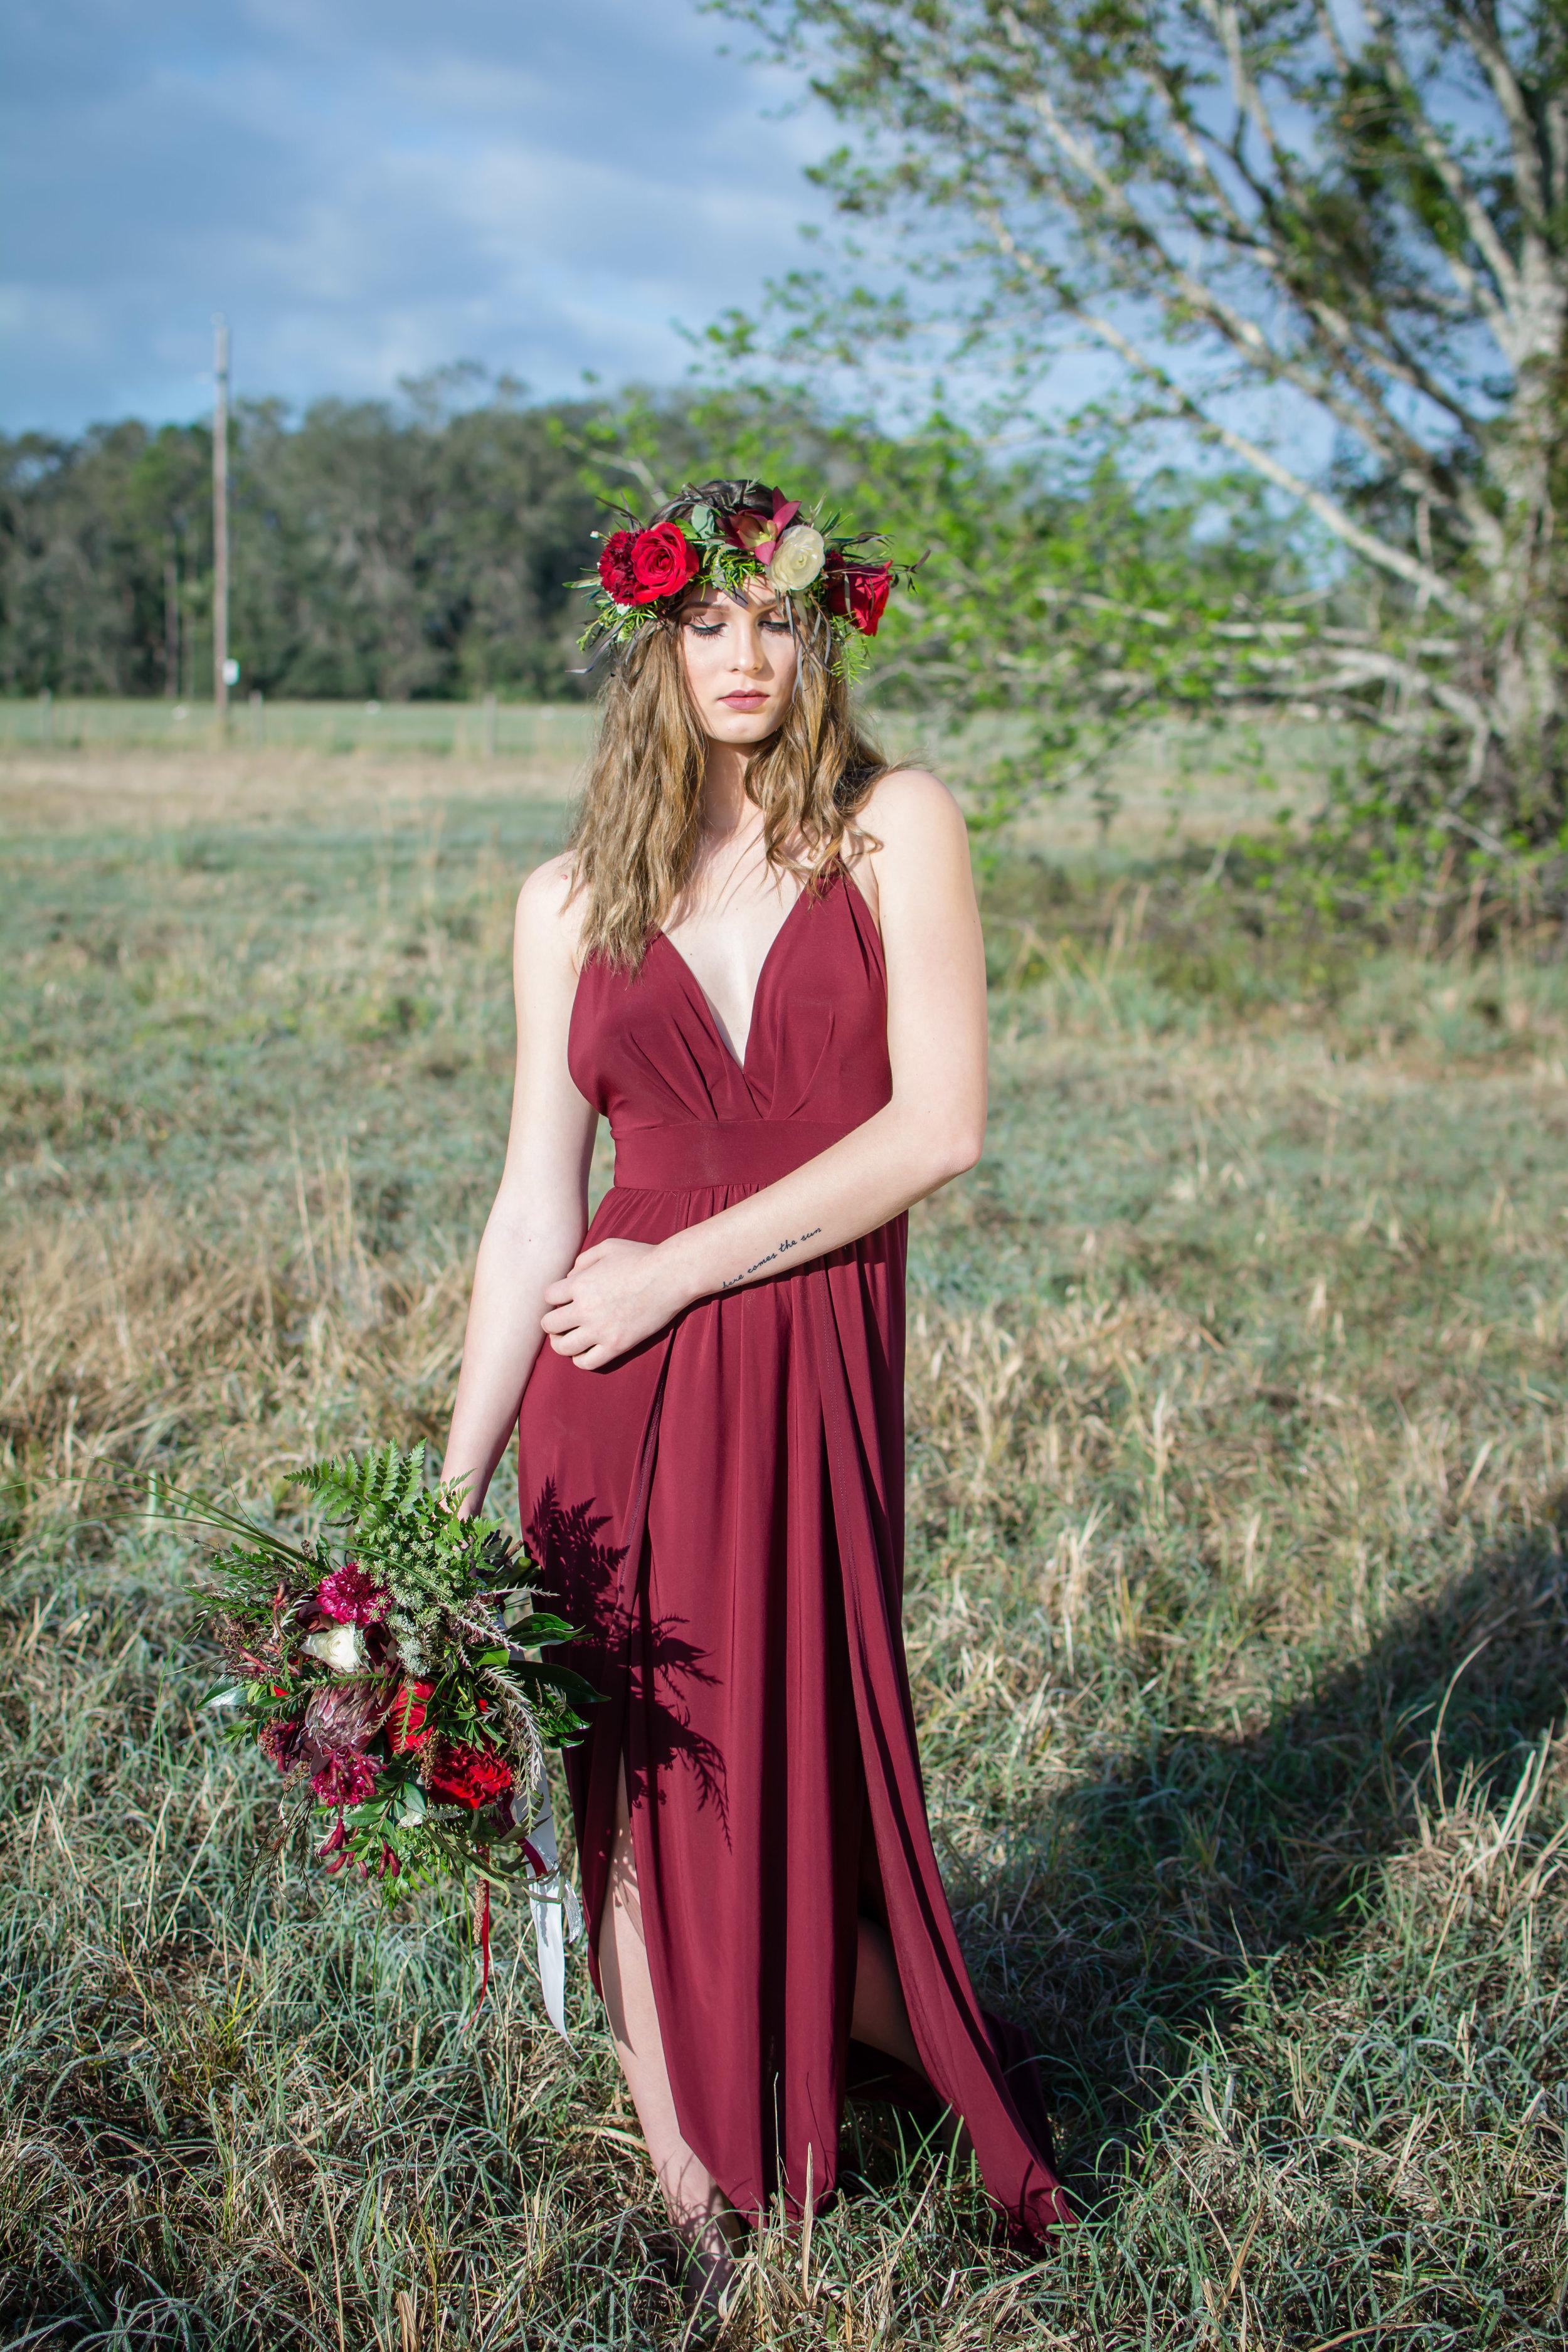 whimsical-bridal-inspiration-fashion-photoshoot-geneva-photographer-yanitza-ninett-8.jpg